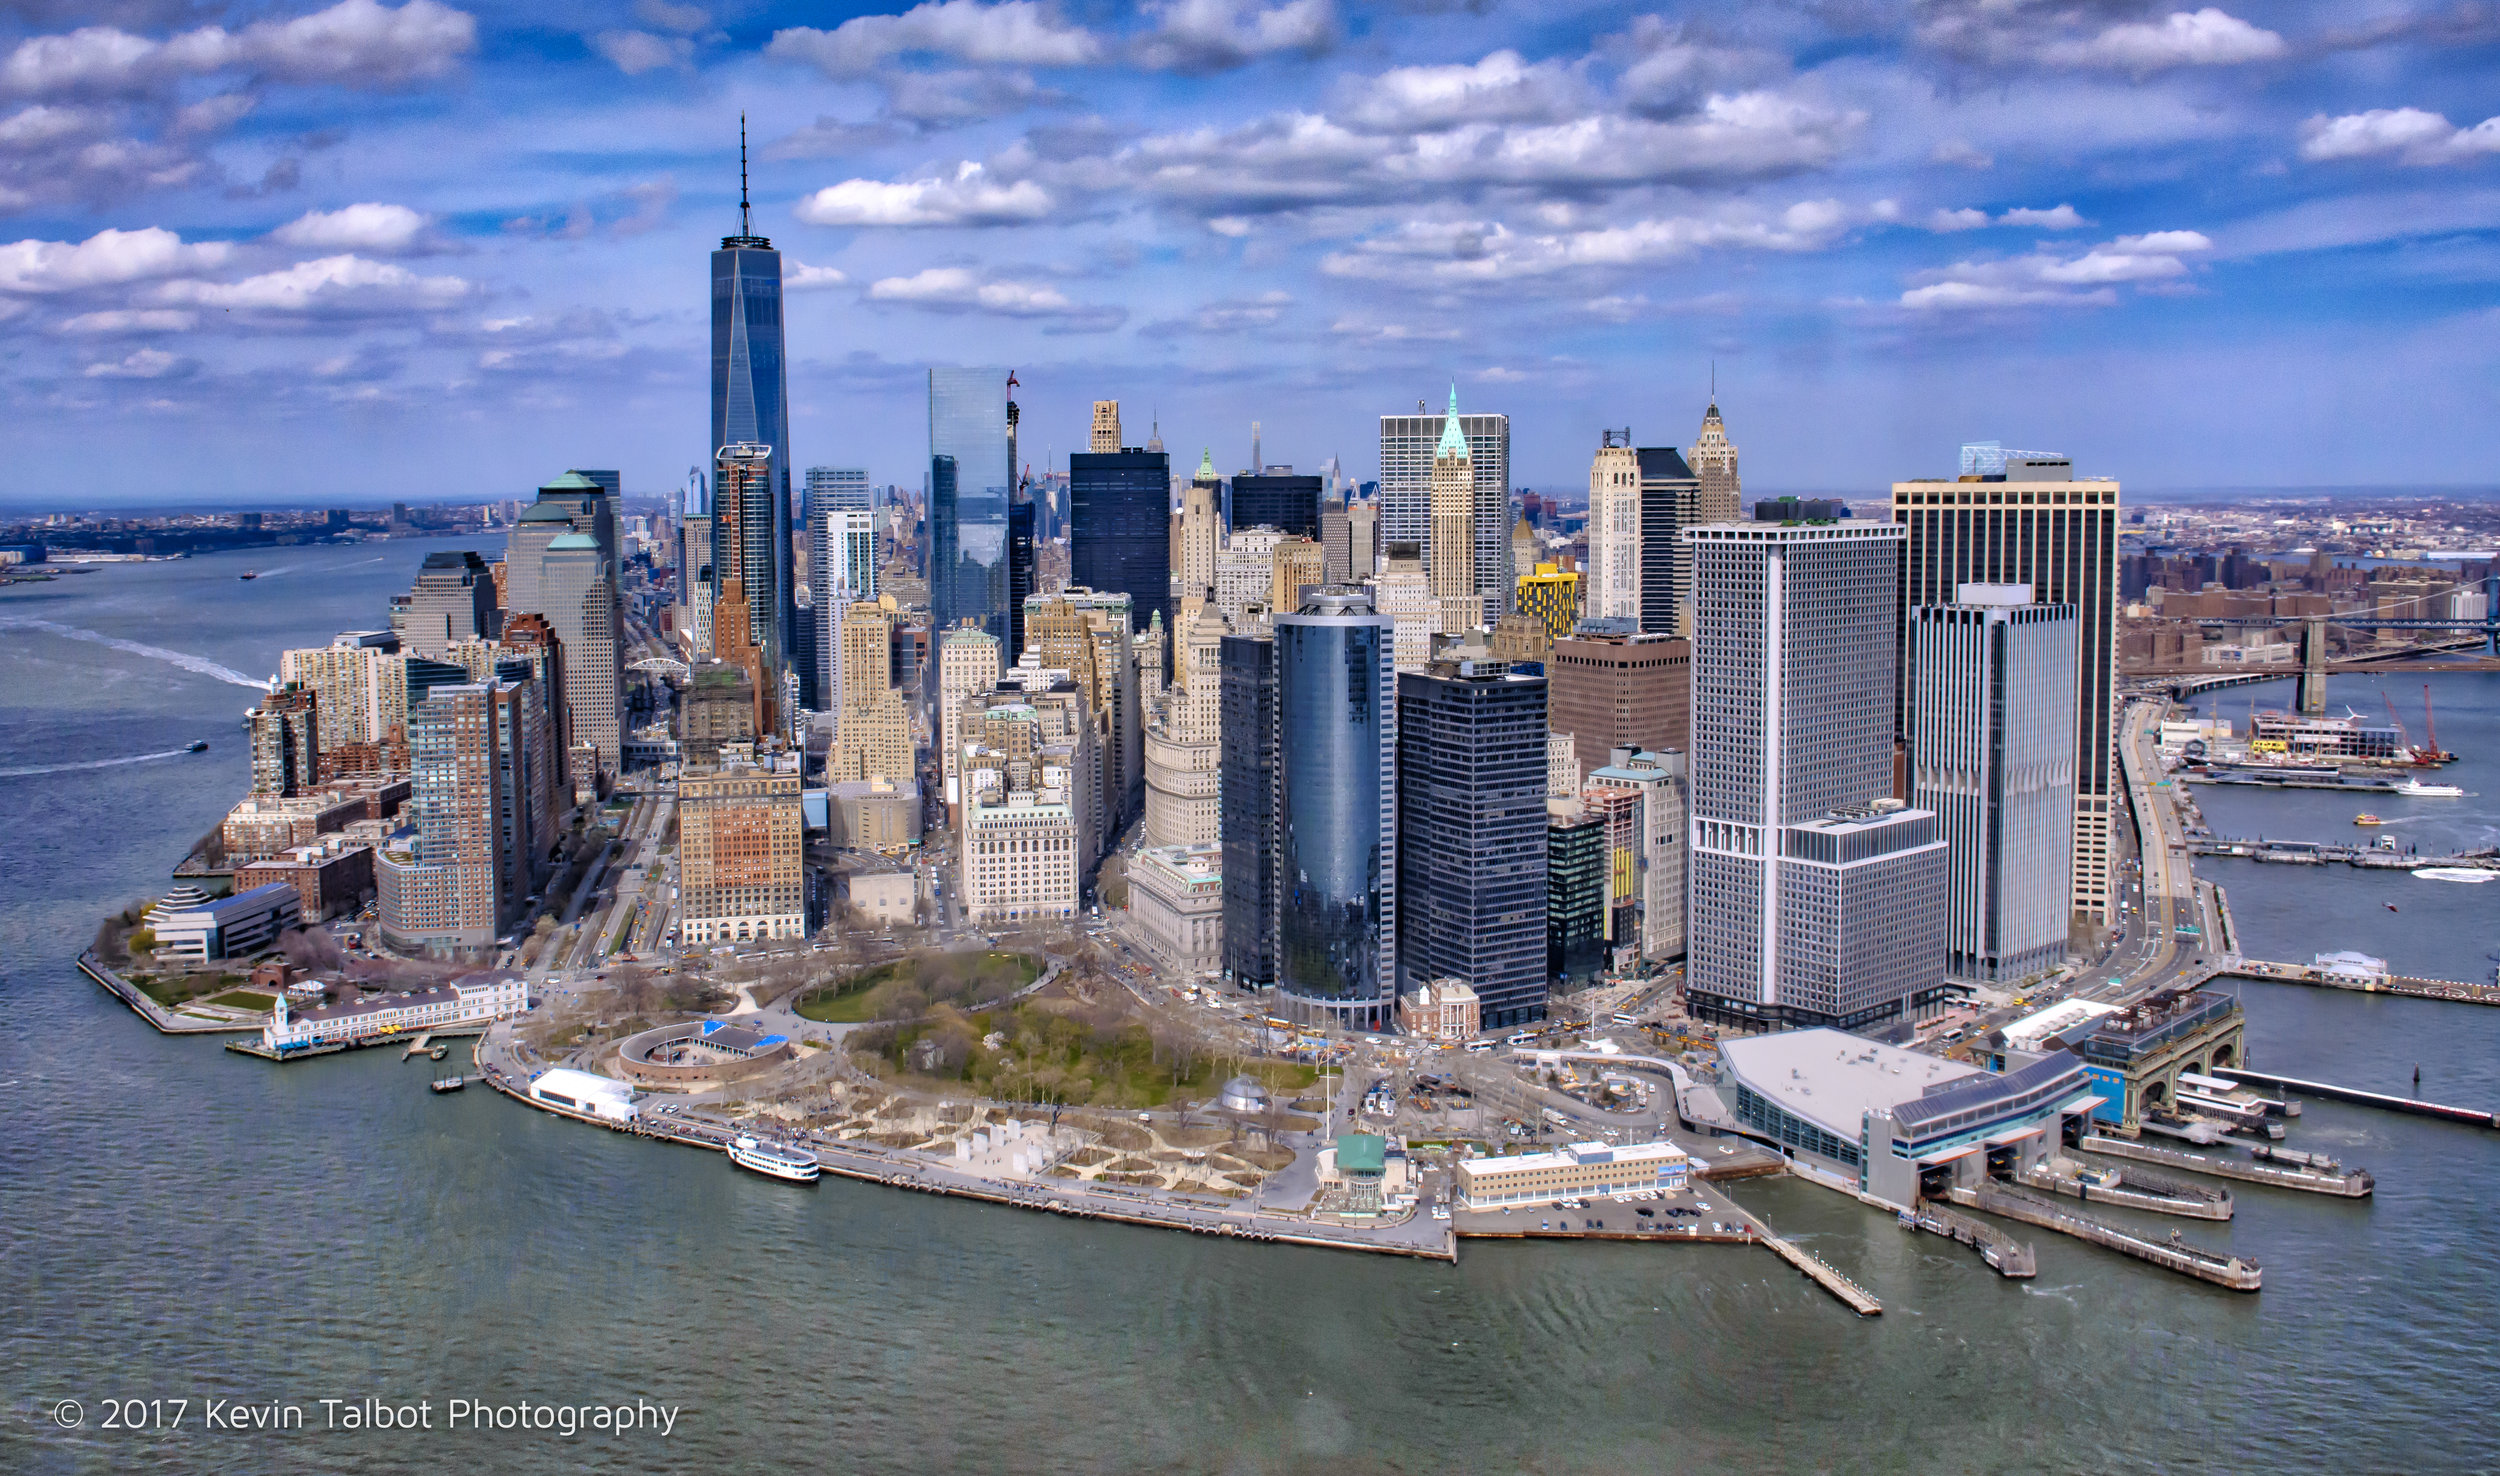 Downton Manhattan from the air